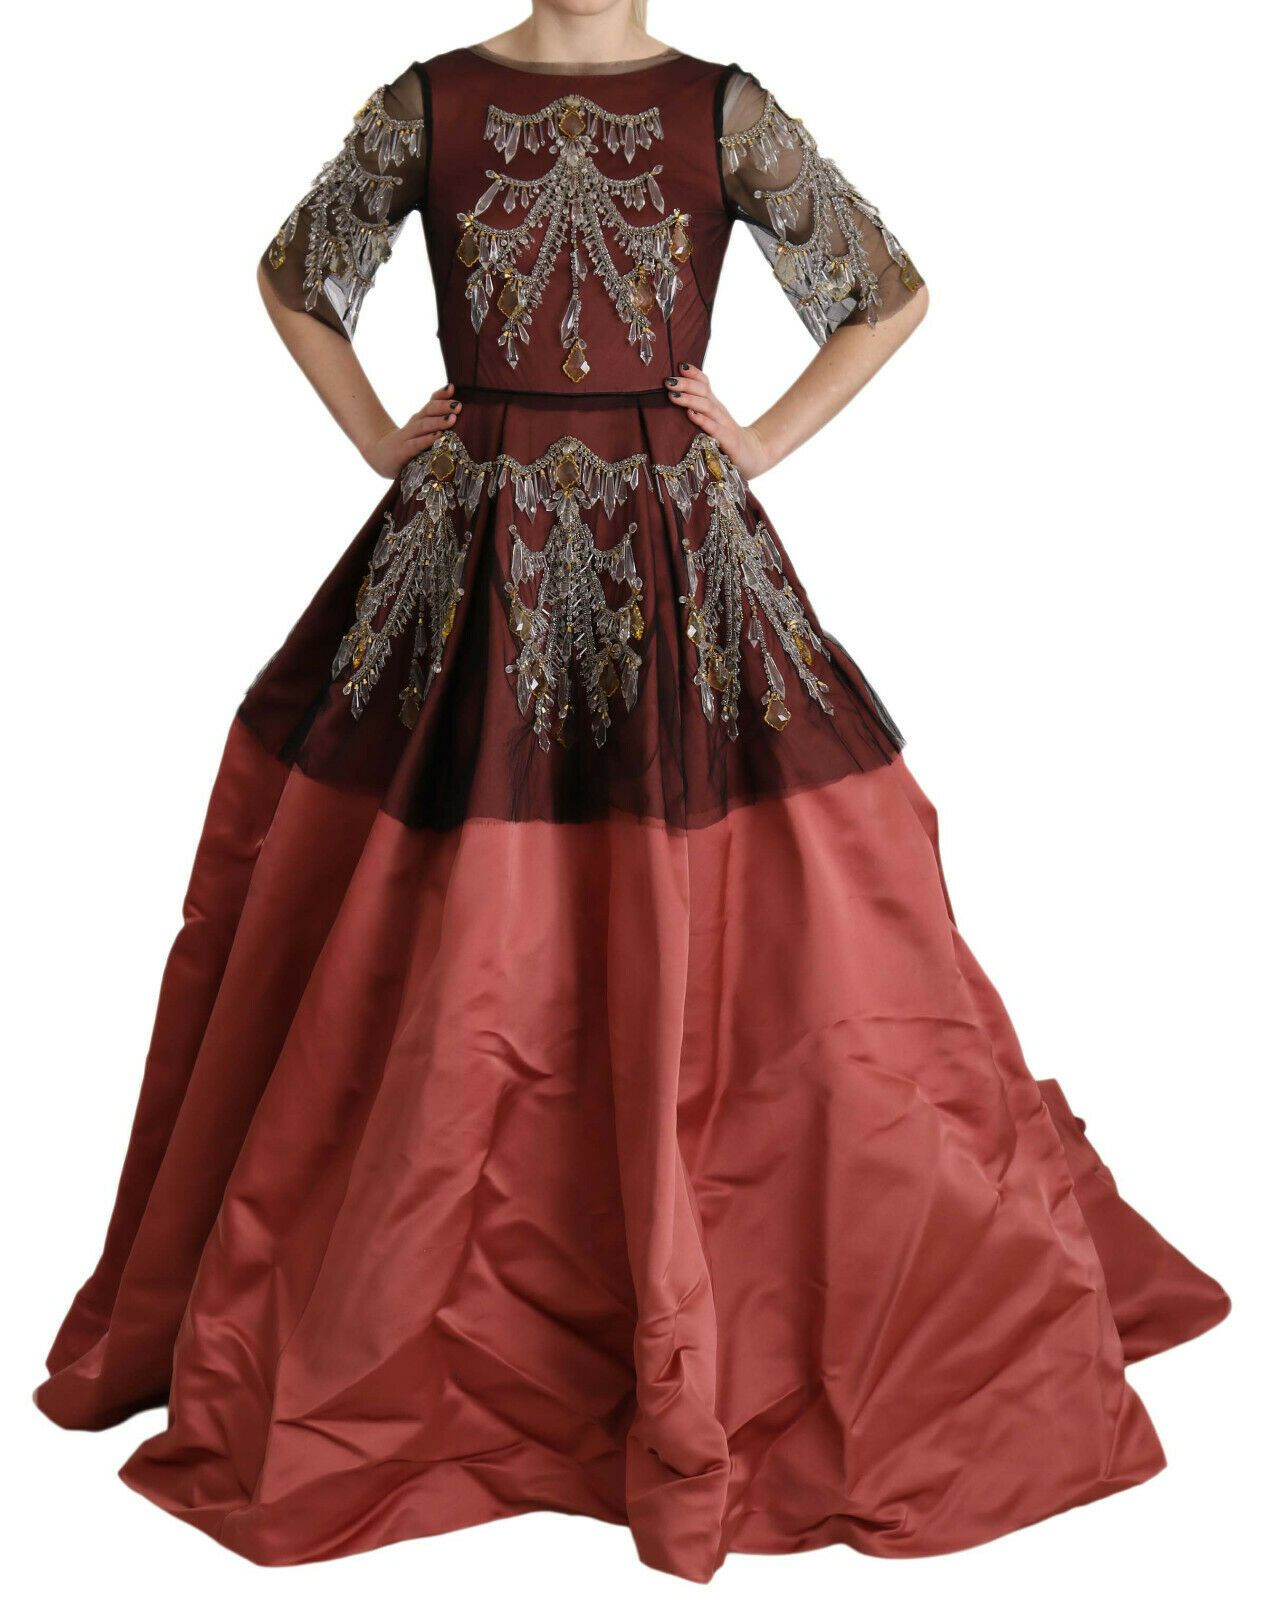 Dolce & Gabbana Women's Crystal Chandelier Silk Princess Gown Dress Pink DR1680 - IT40|S